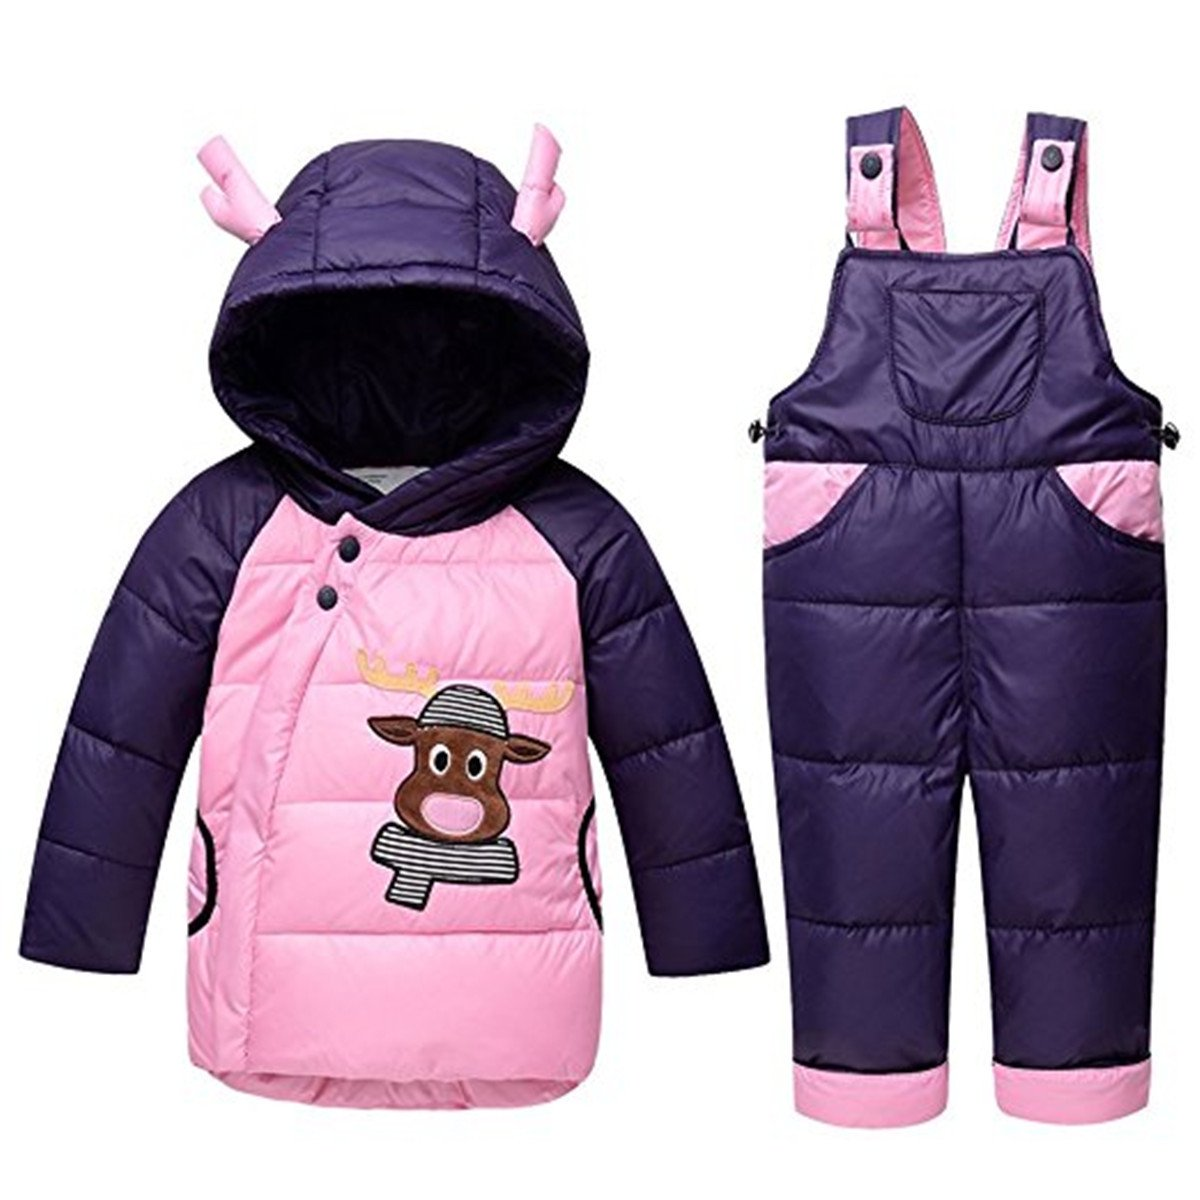 JELEUON Baby Girls Winter Warm Cute Cow Cartoon Snowsuit Puffer Down Snow Jacket with Snow Ski Bib Pants Outfits